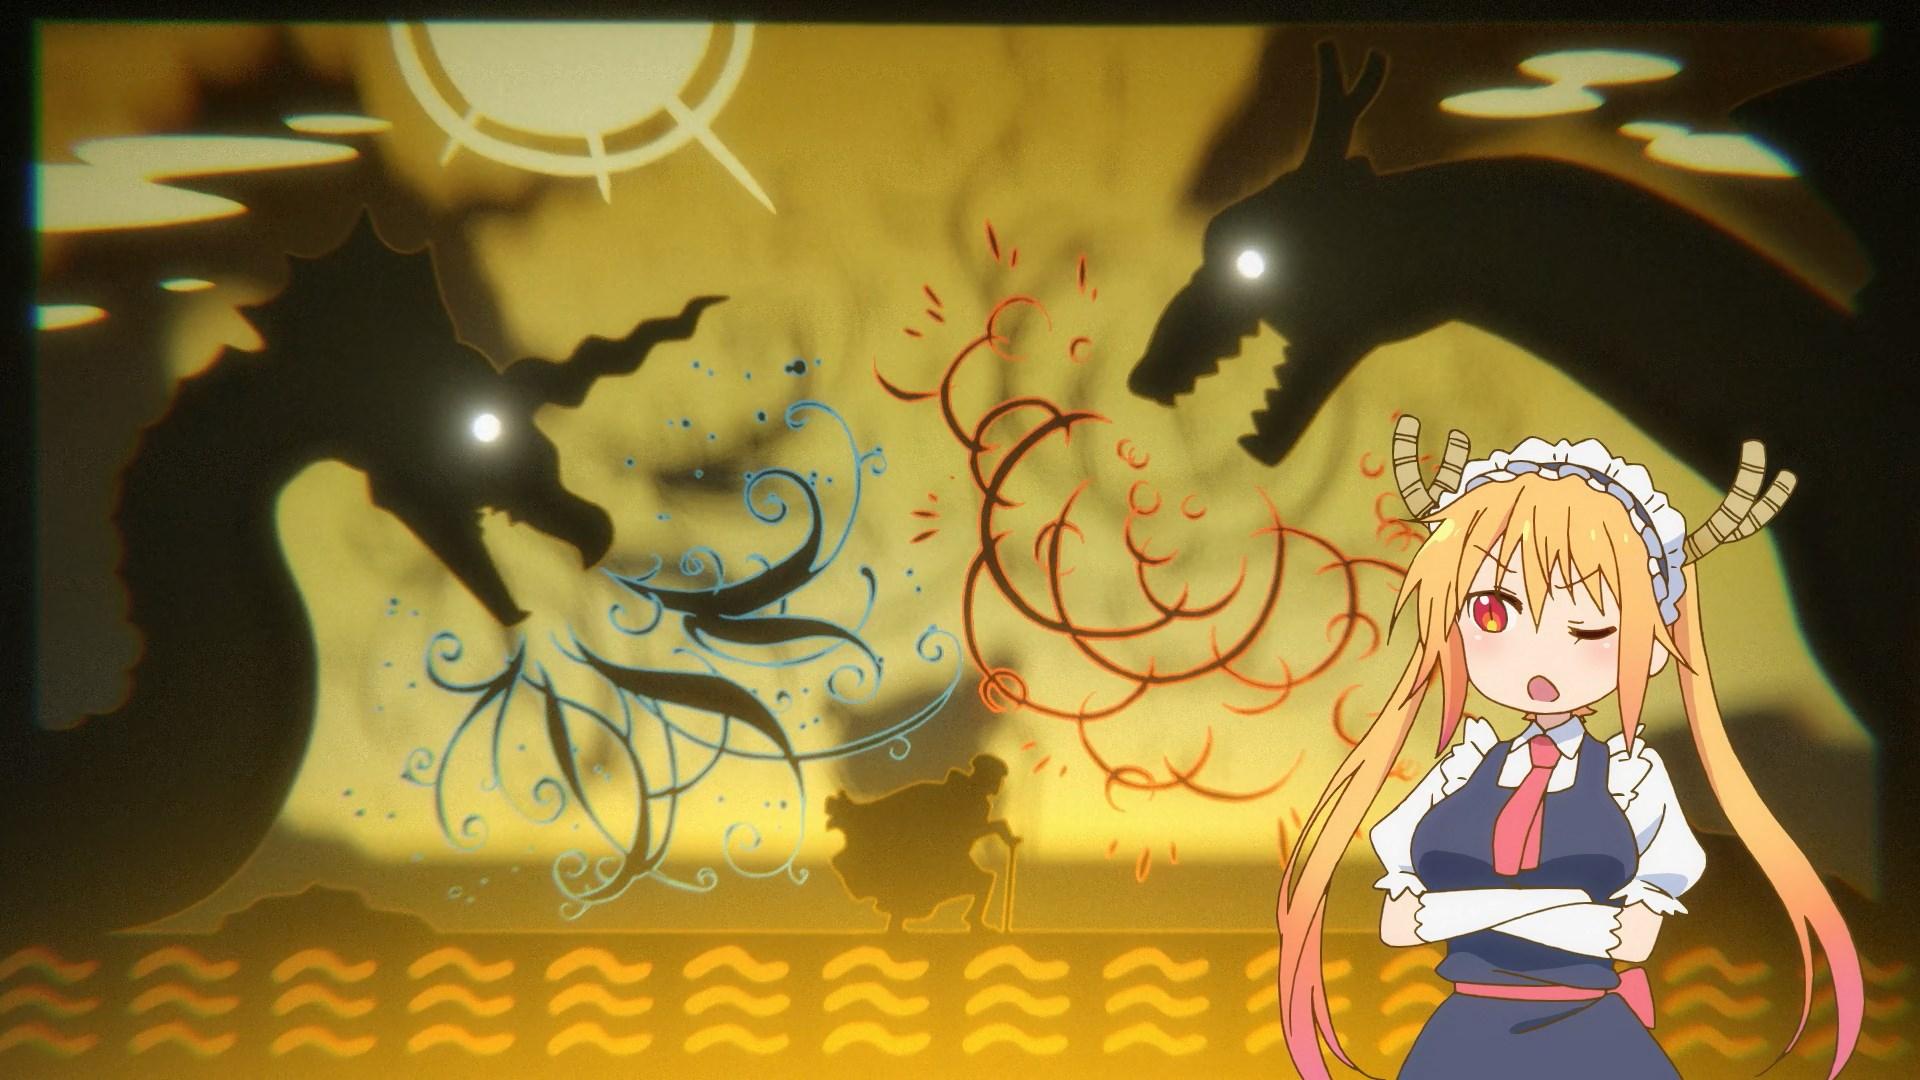 Tohru recalls past Elma challenge